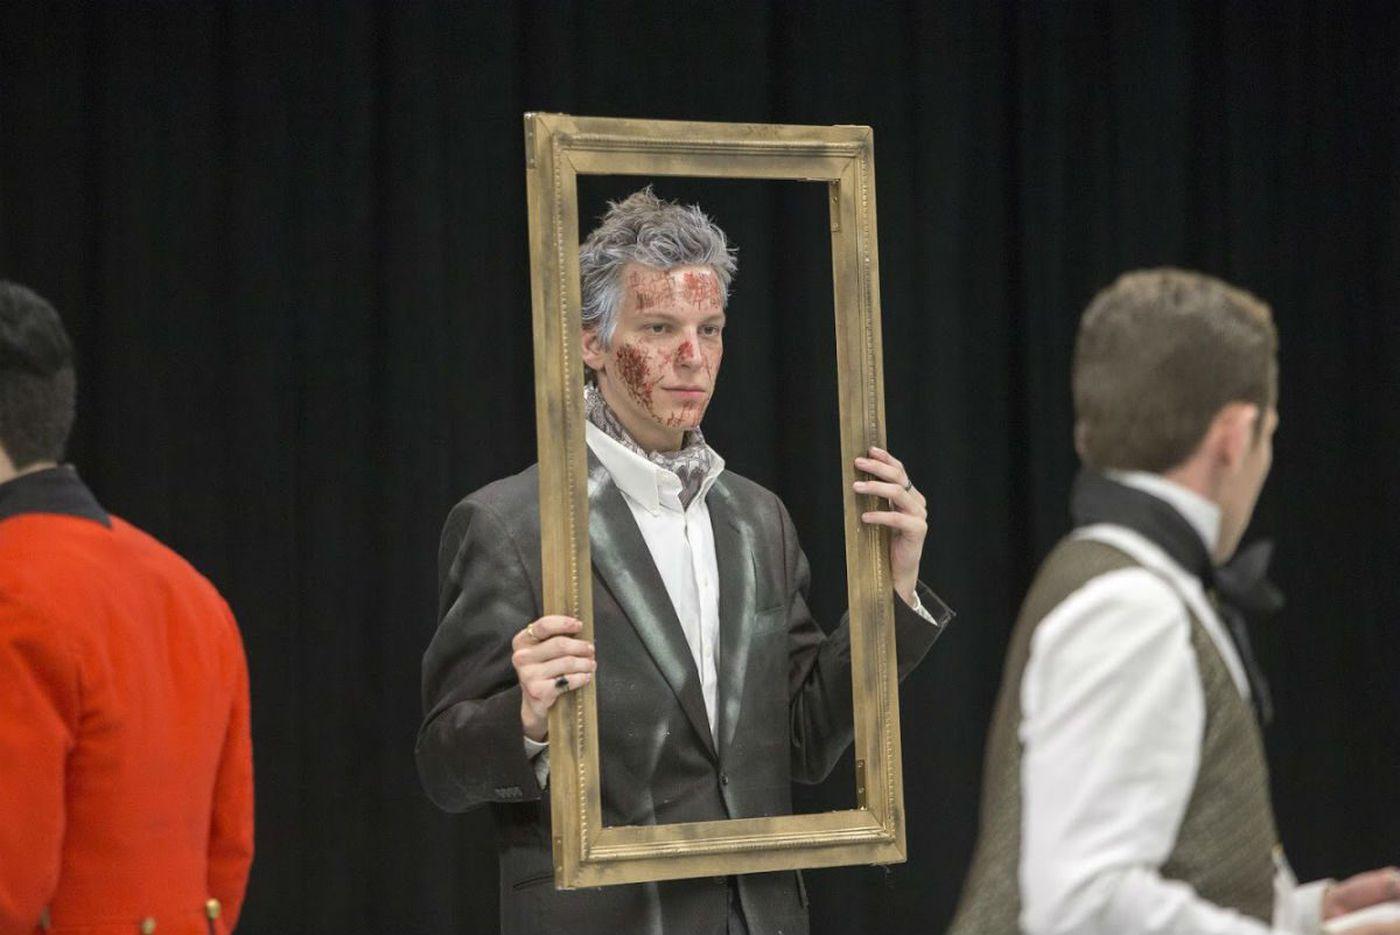 Villanova grad's 'Dorian Gray' chosen for off-Broadway run this week